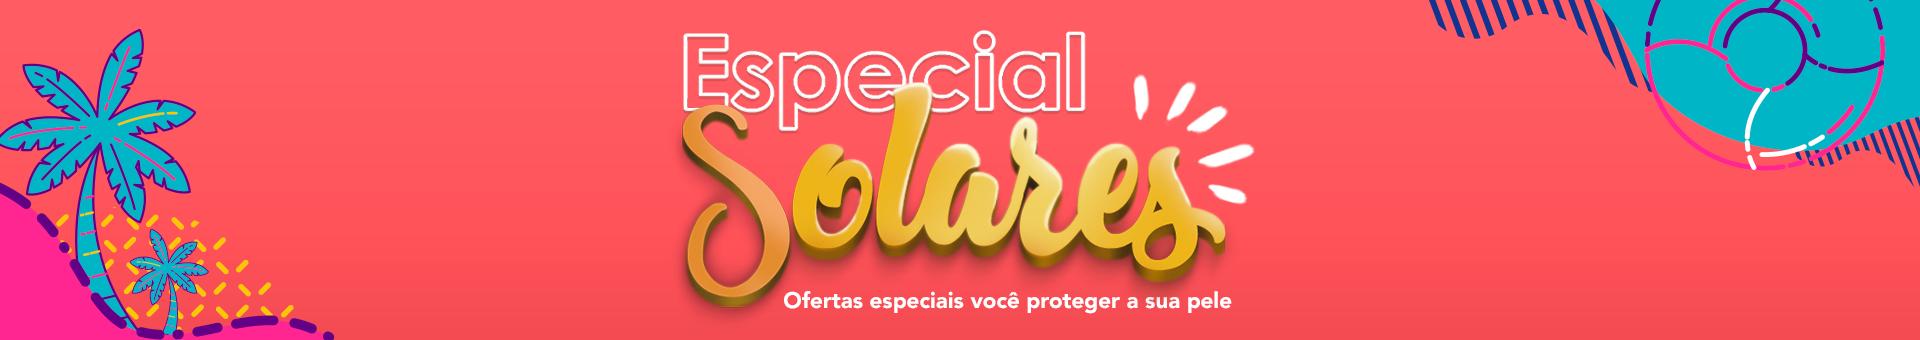 Banner Solares Janeiro